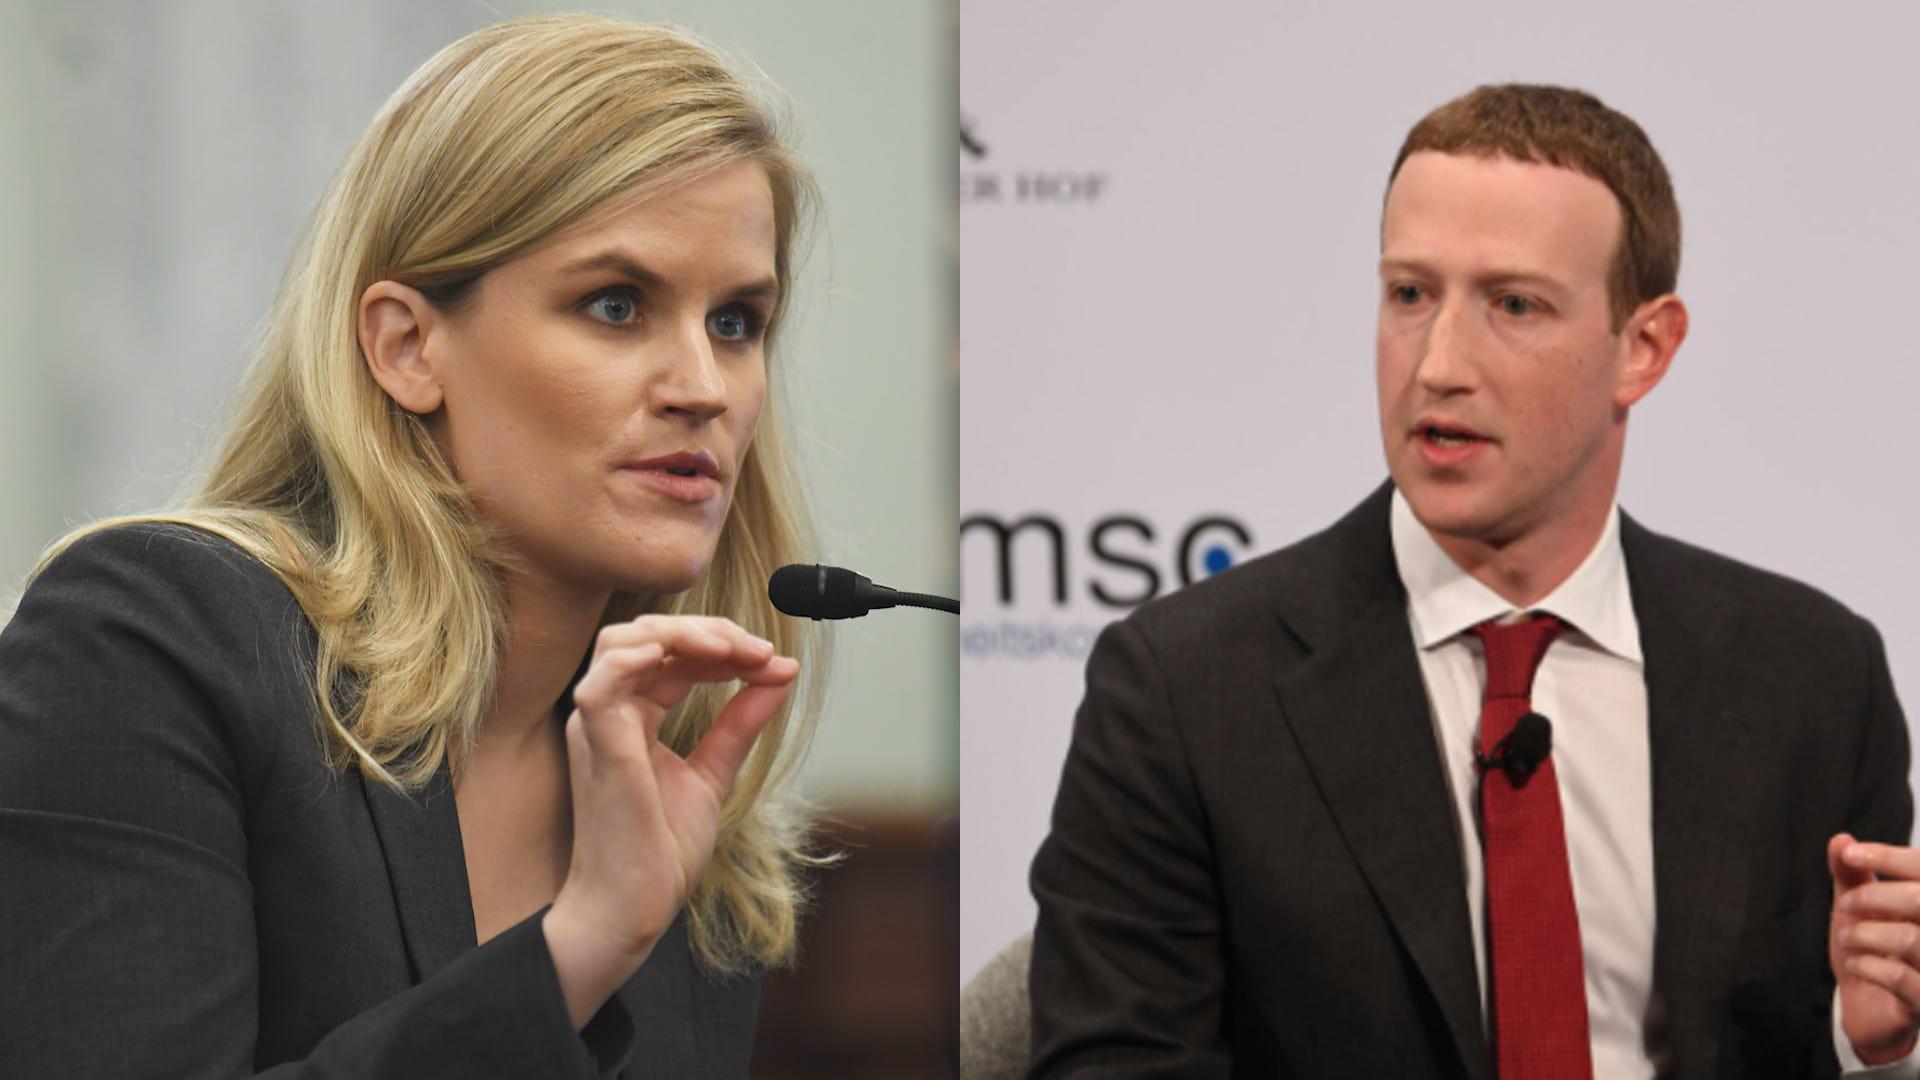 Frances Haugen và Mark Zuckerberg. Ảnh: USA Today/Reuters